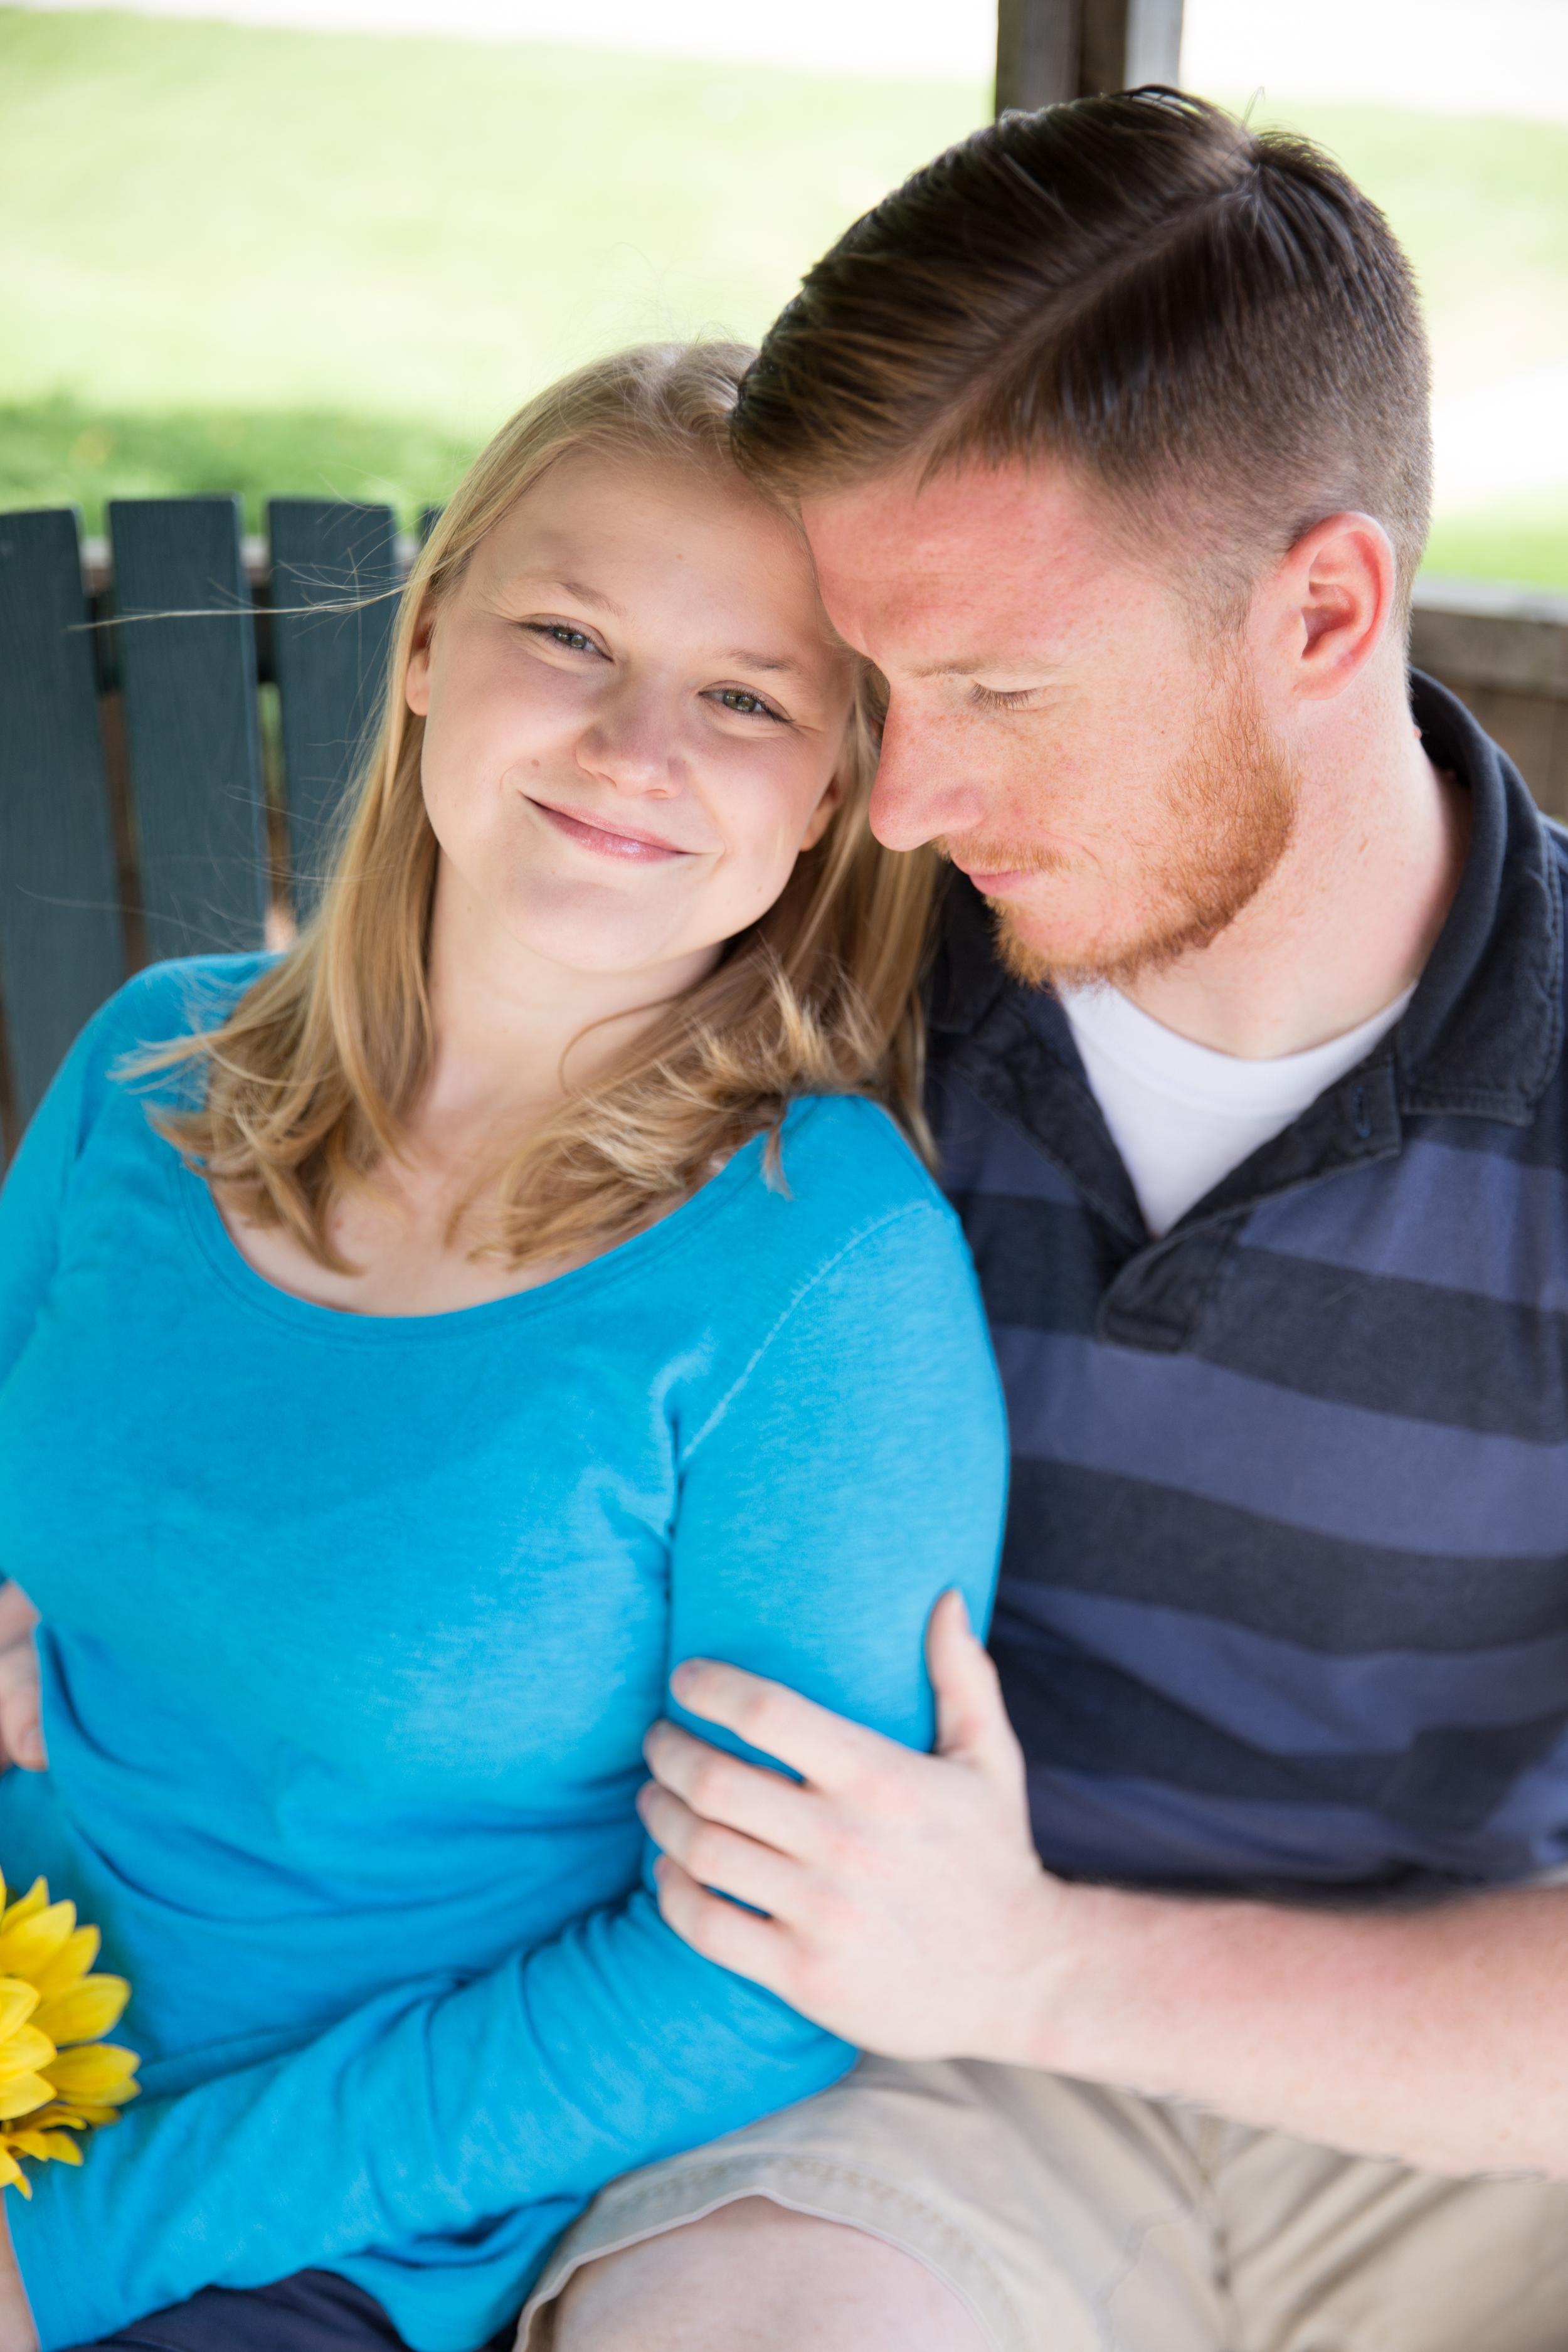 Appleton Wisconsin Engagement Photos - Whit Meza Photography